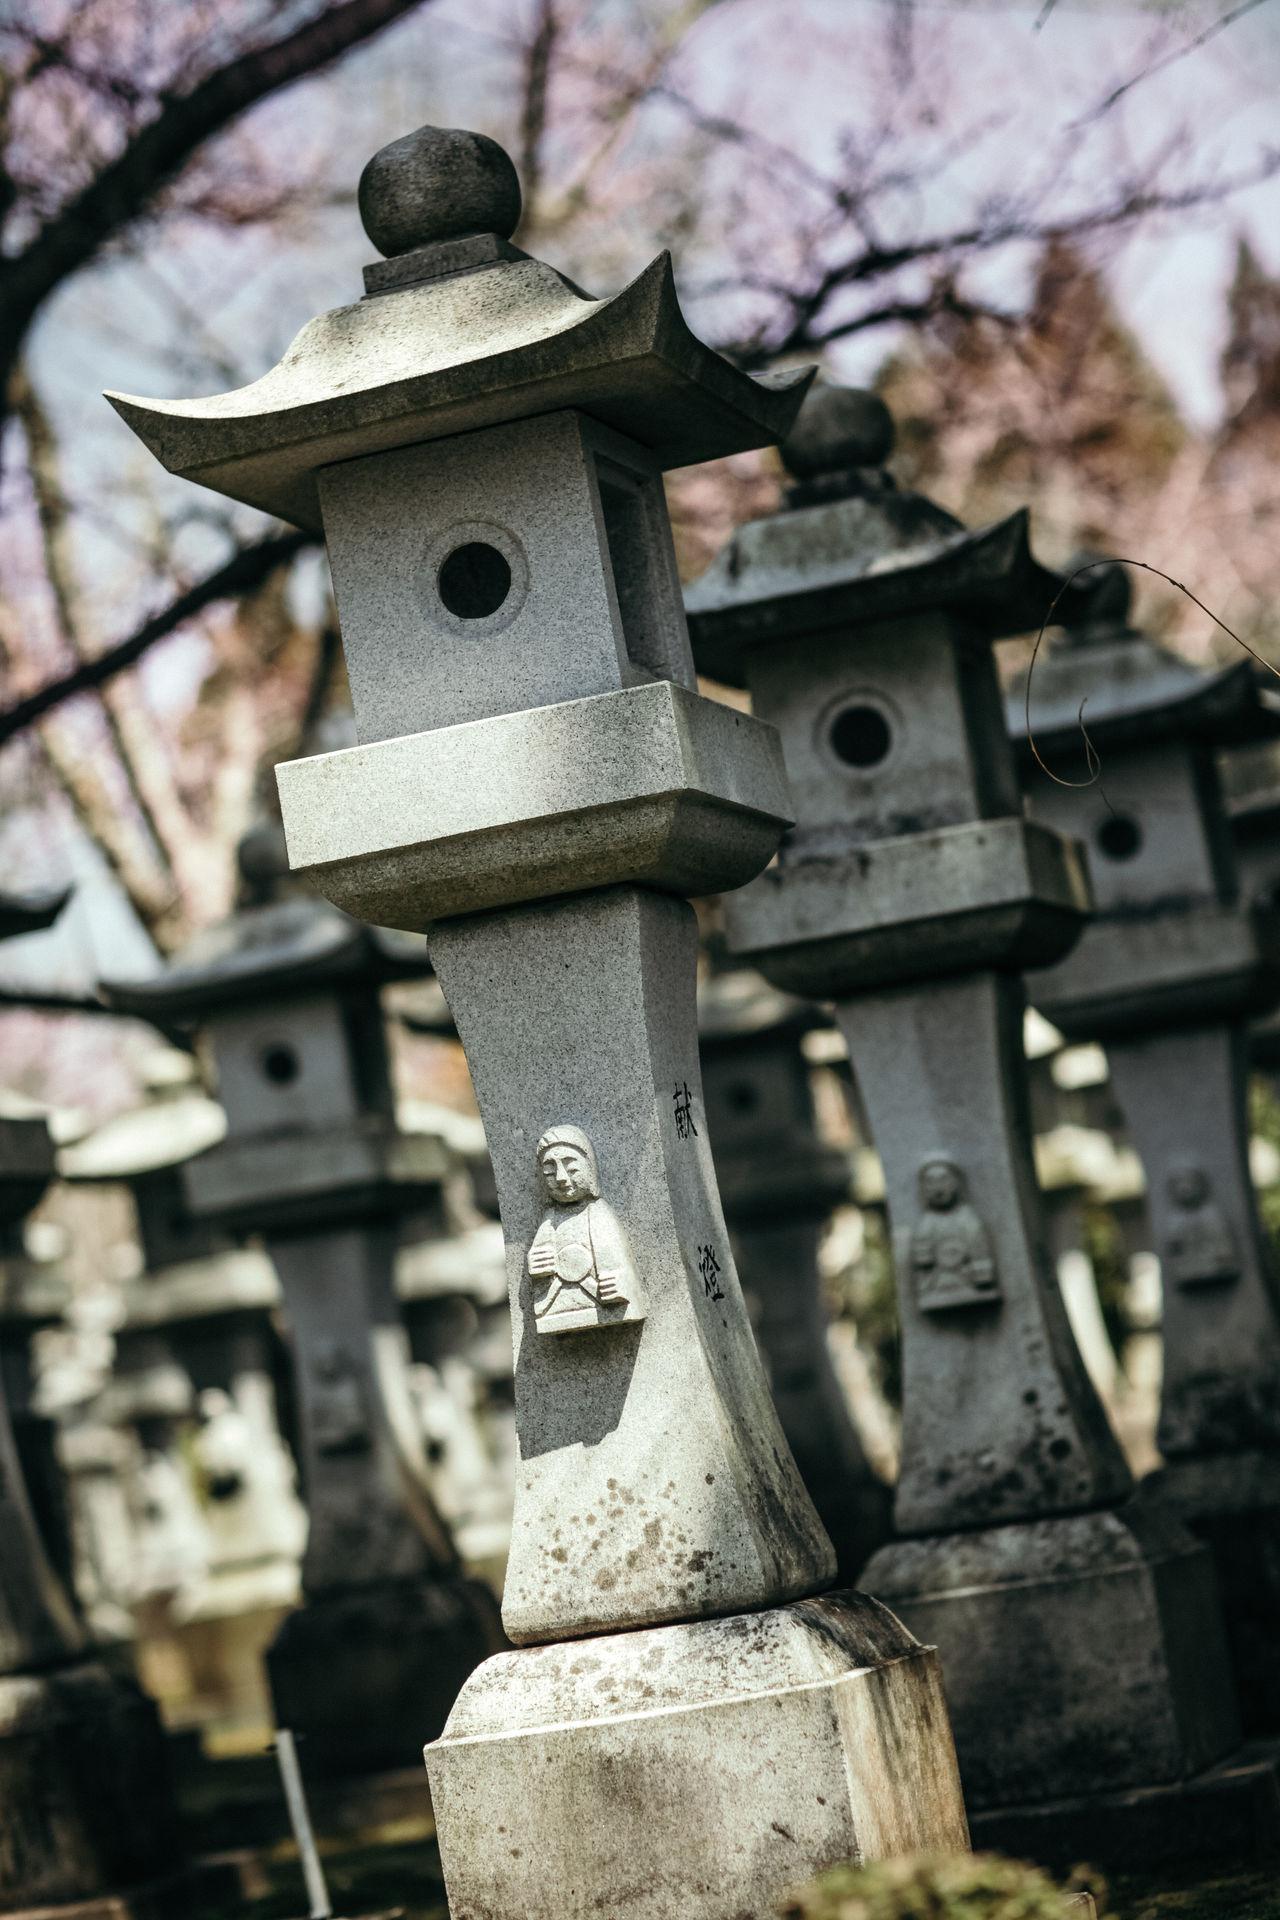 Day Japan Japan Photography Kamikaze Lantern Outdoors Sakura Sakura Blossom Spring Summer World War 2 Memorial